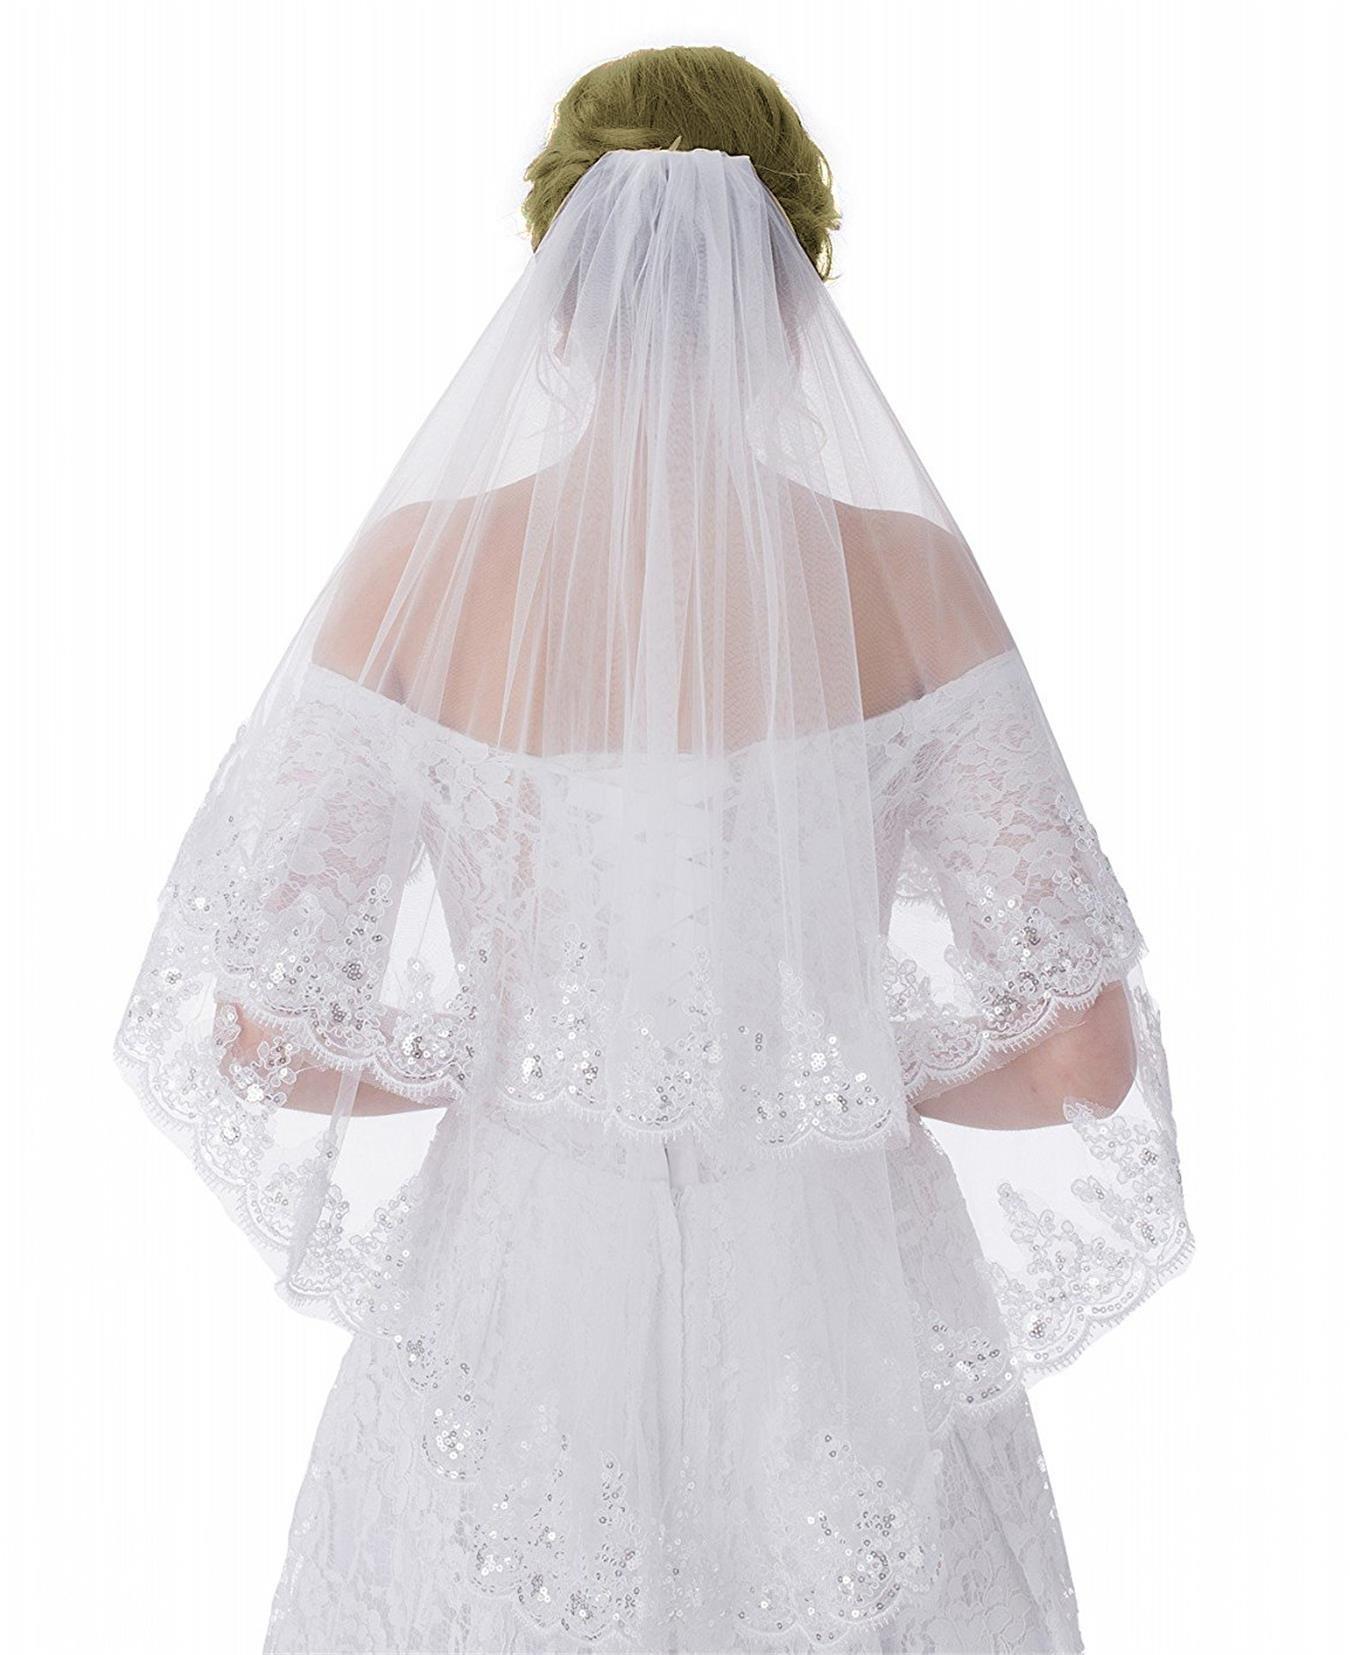 WDING 2 Tier Lace Sequins Appliqued Edge Bridal Wedding Veil Fingertip Length 35'' (white)